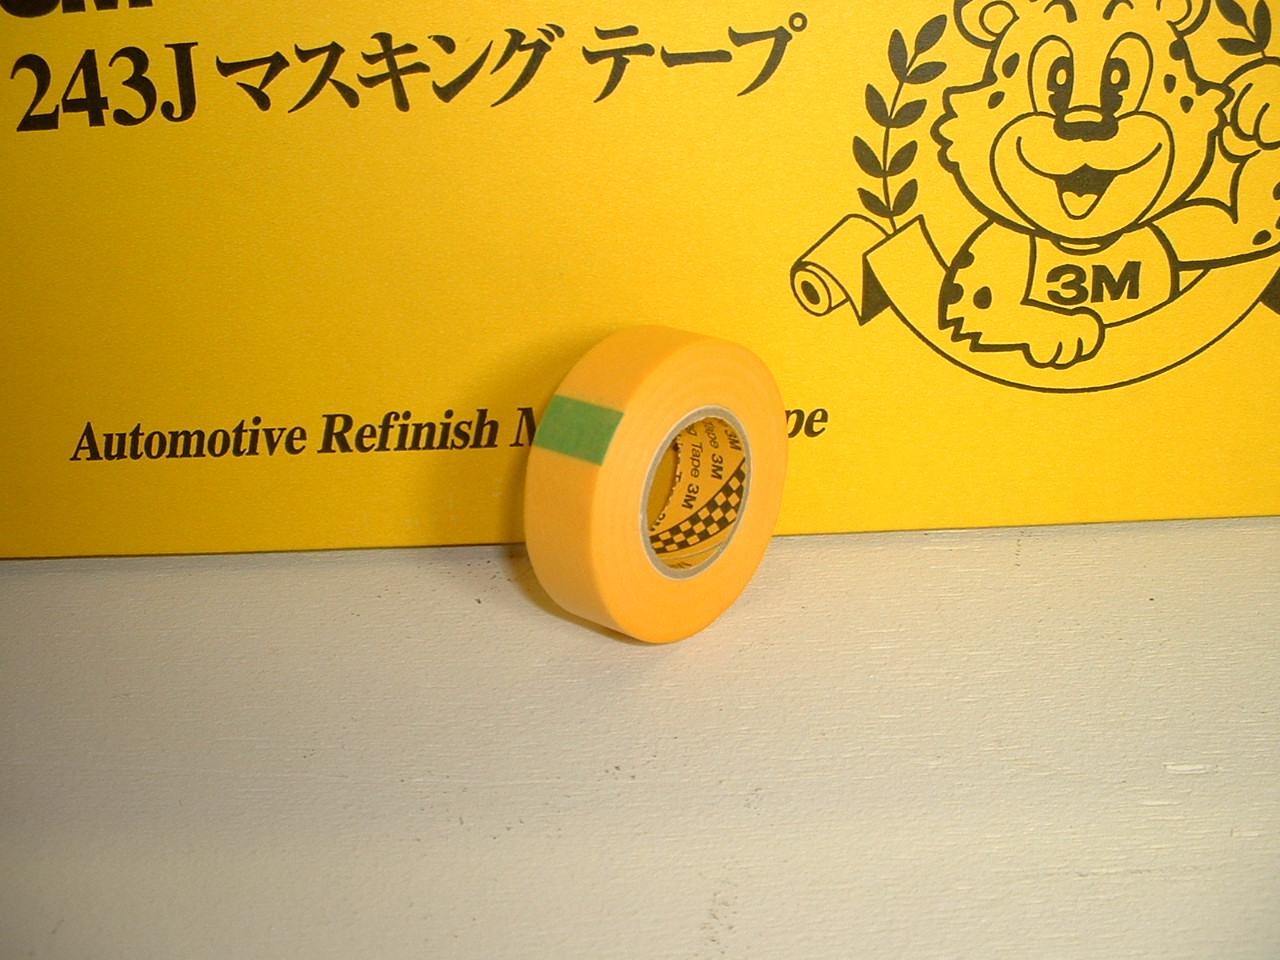 3M マスキング スリーエム 養生 見切り用テープ ラッカーテープ 黄色いテープ マスキングテープ 12mm幅 1巻